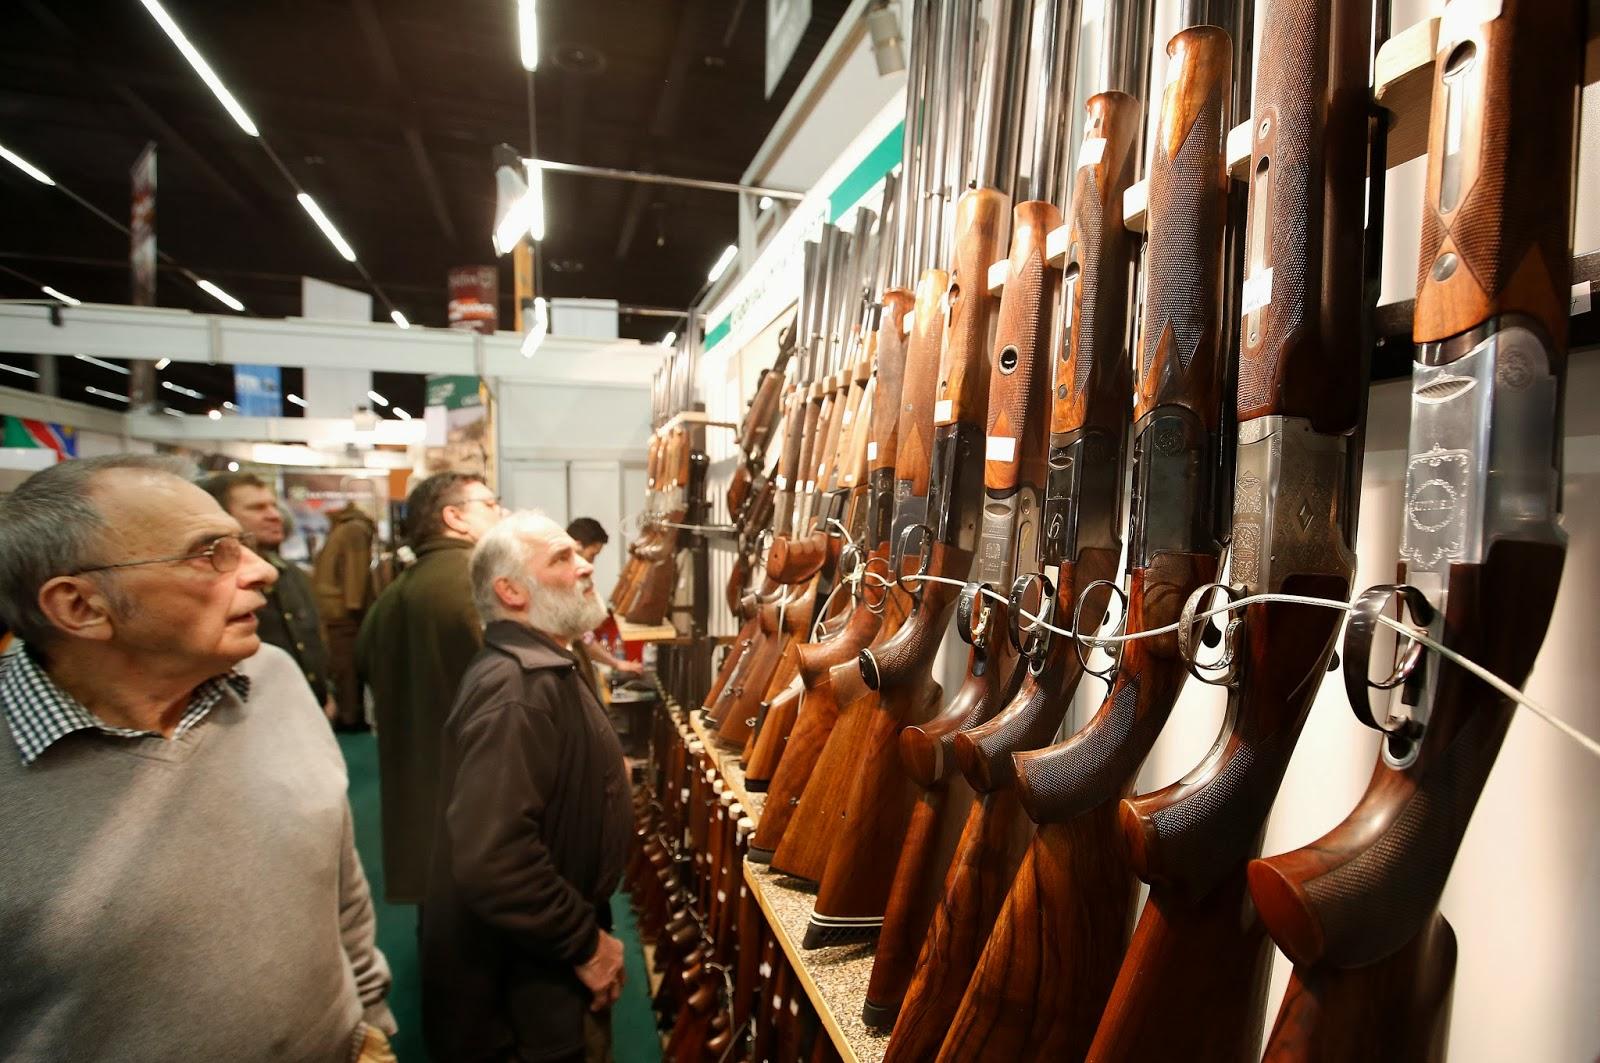 Austria, Brandl Bracke, Business, Dogs, Economy, Exhibitor, Fishing, Handgun, Hohe Jagd, Hunting, Hunting dogs, Hunting Fair, Hunting rifles, Lifestyle, Rifles, Salzburg, Shotguns, Trade Fair, Trade Show, Vehicles, Animals,